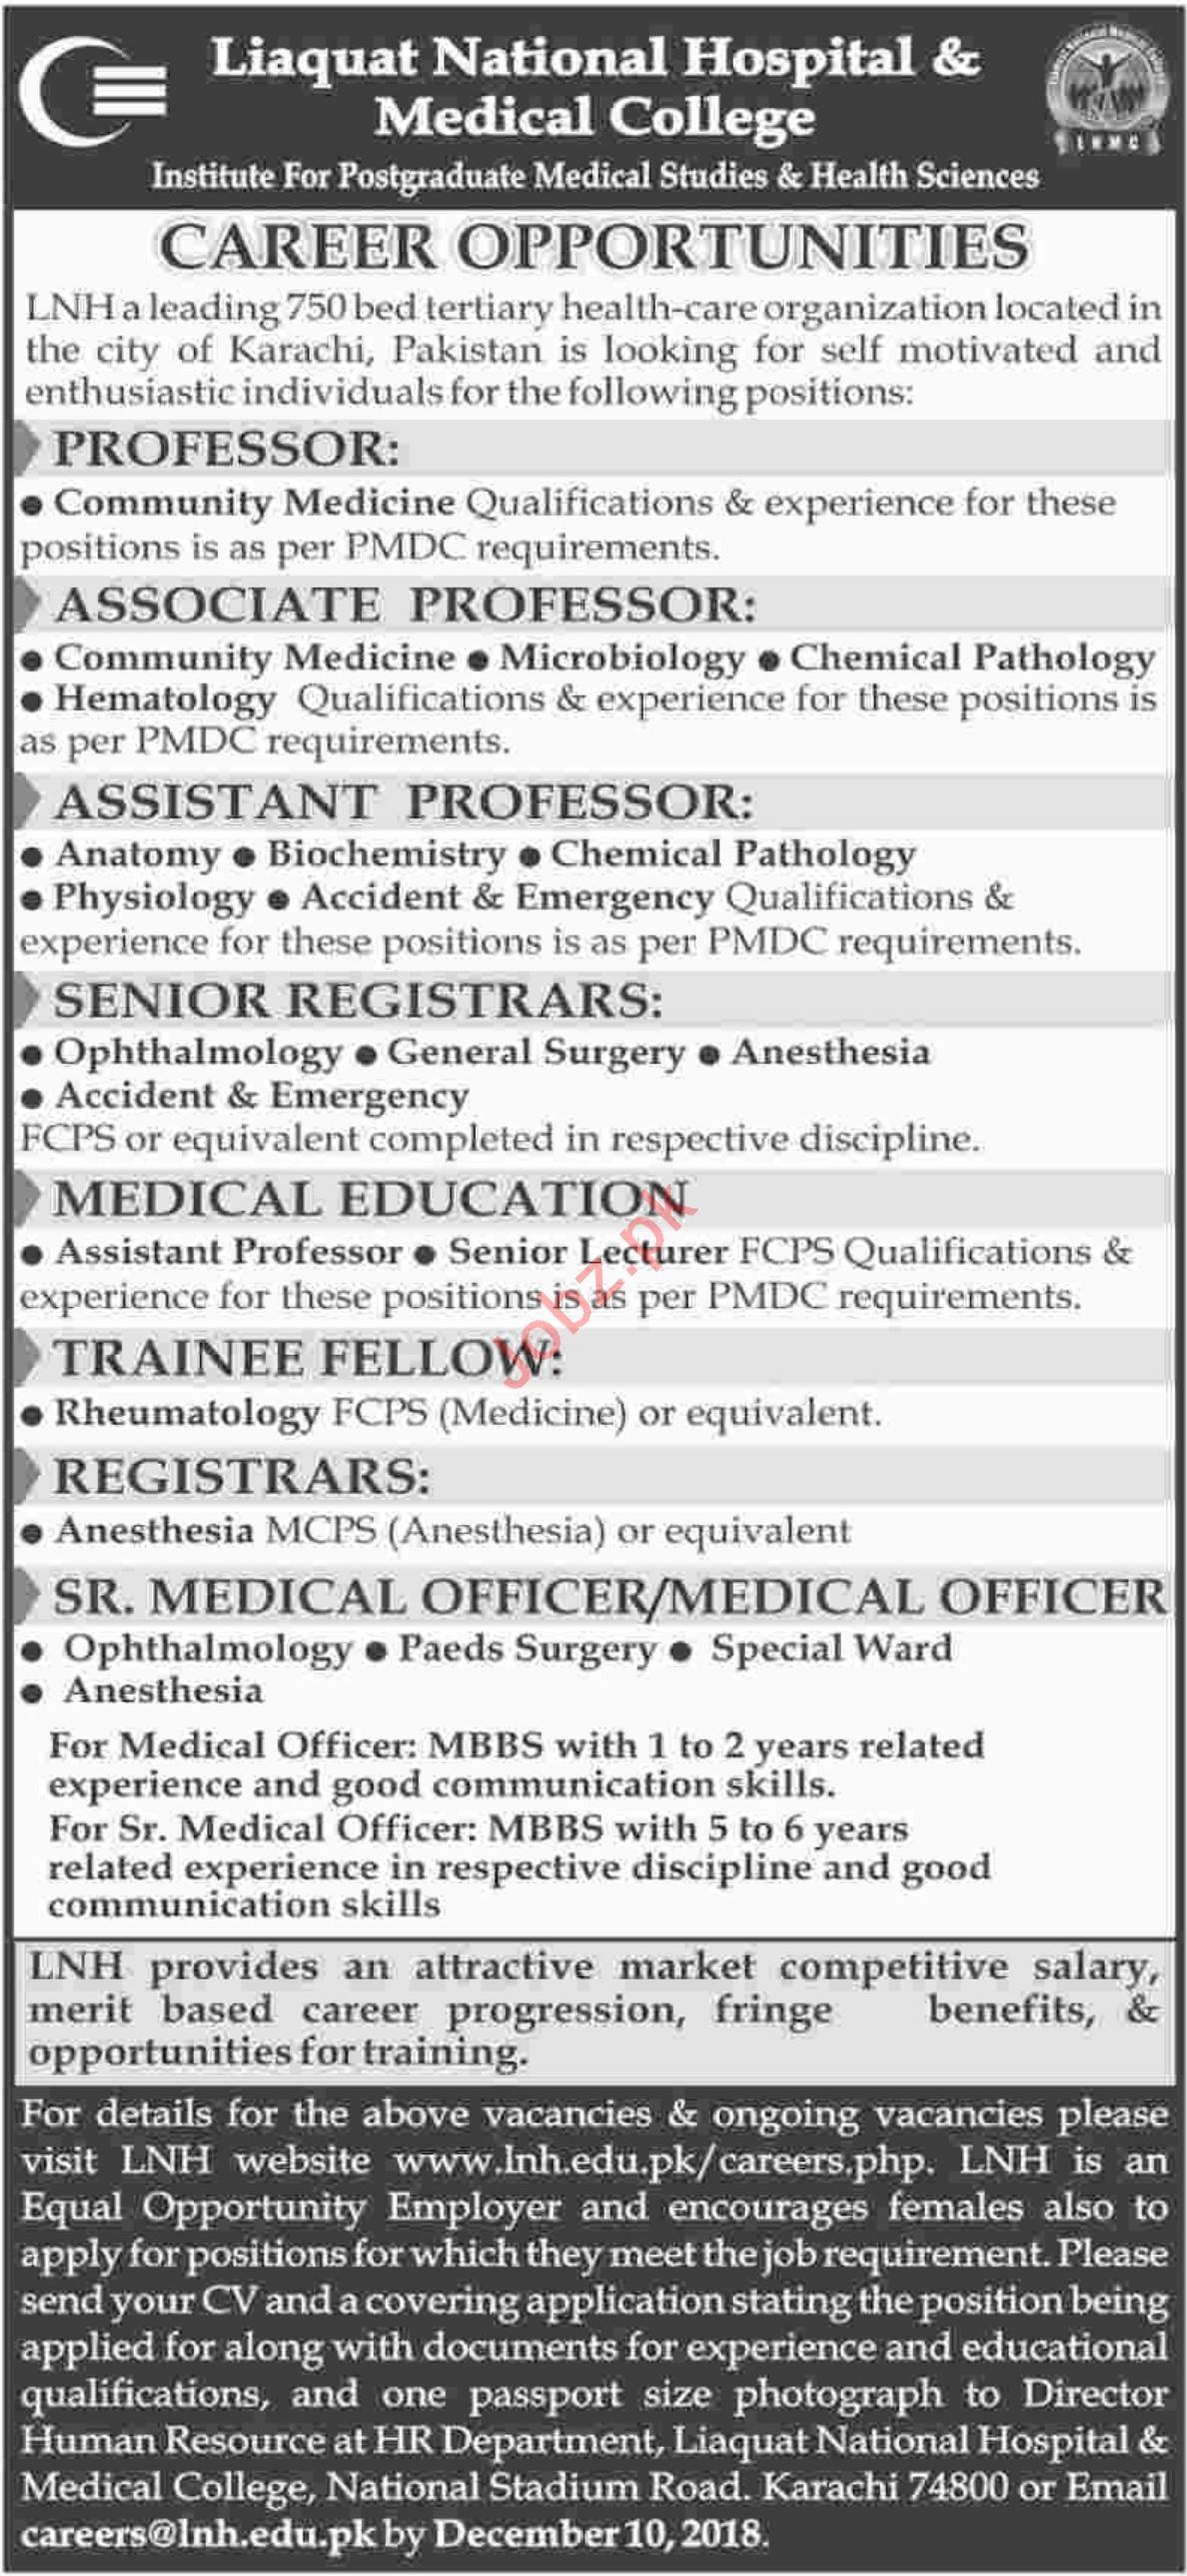 Liaquat National Hospital & Medical College Faculty Jobs